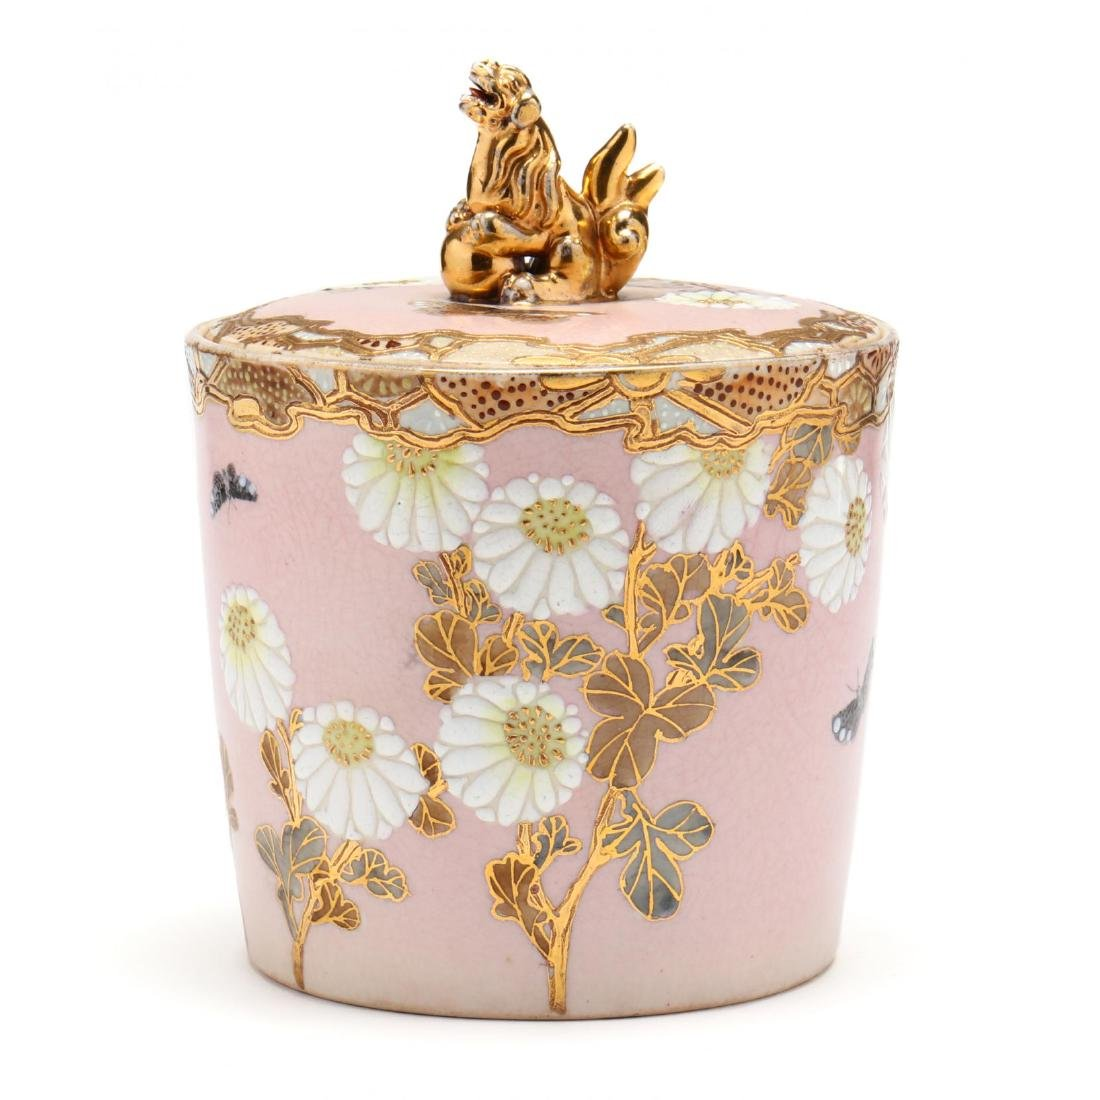 An Antique Japanese Moriage Biscuit Jar